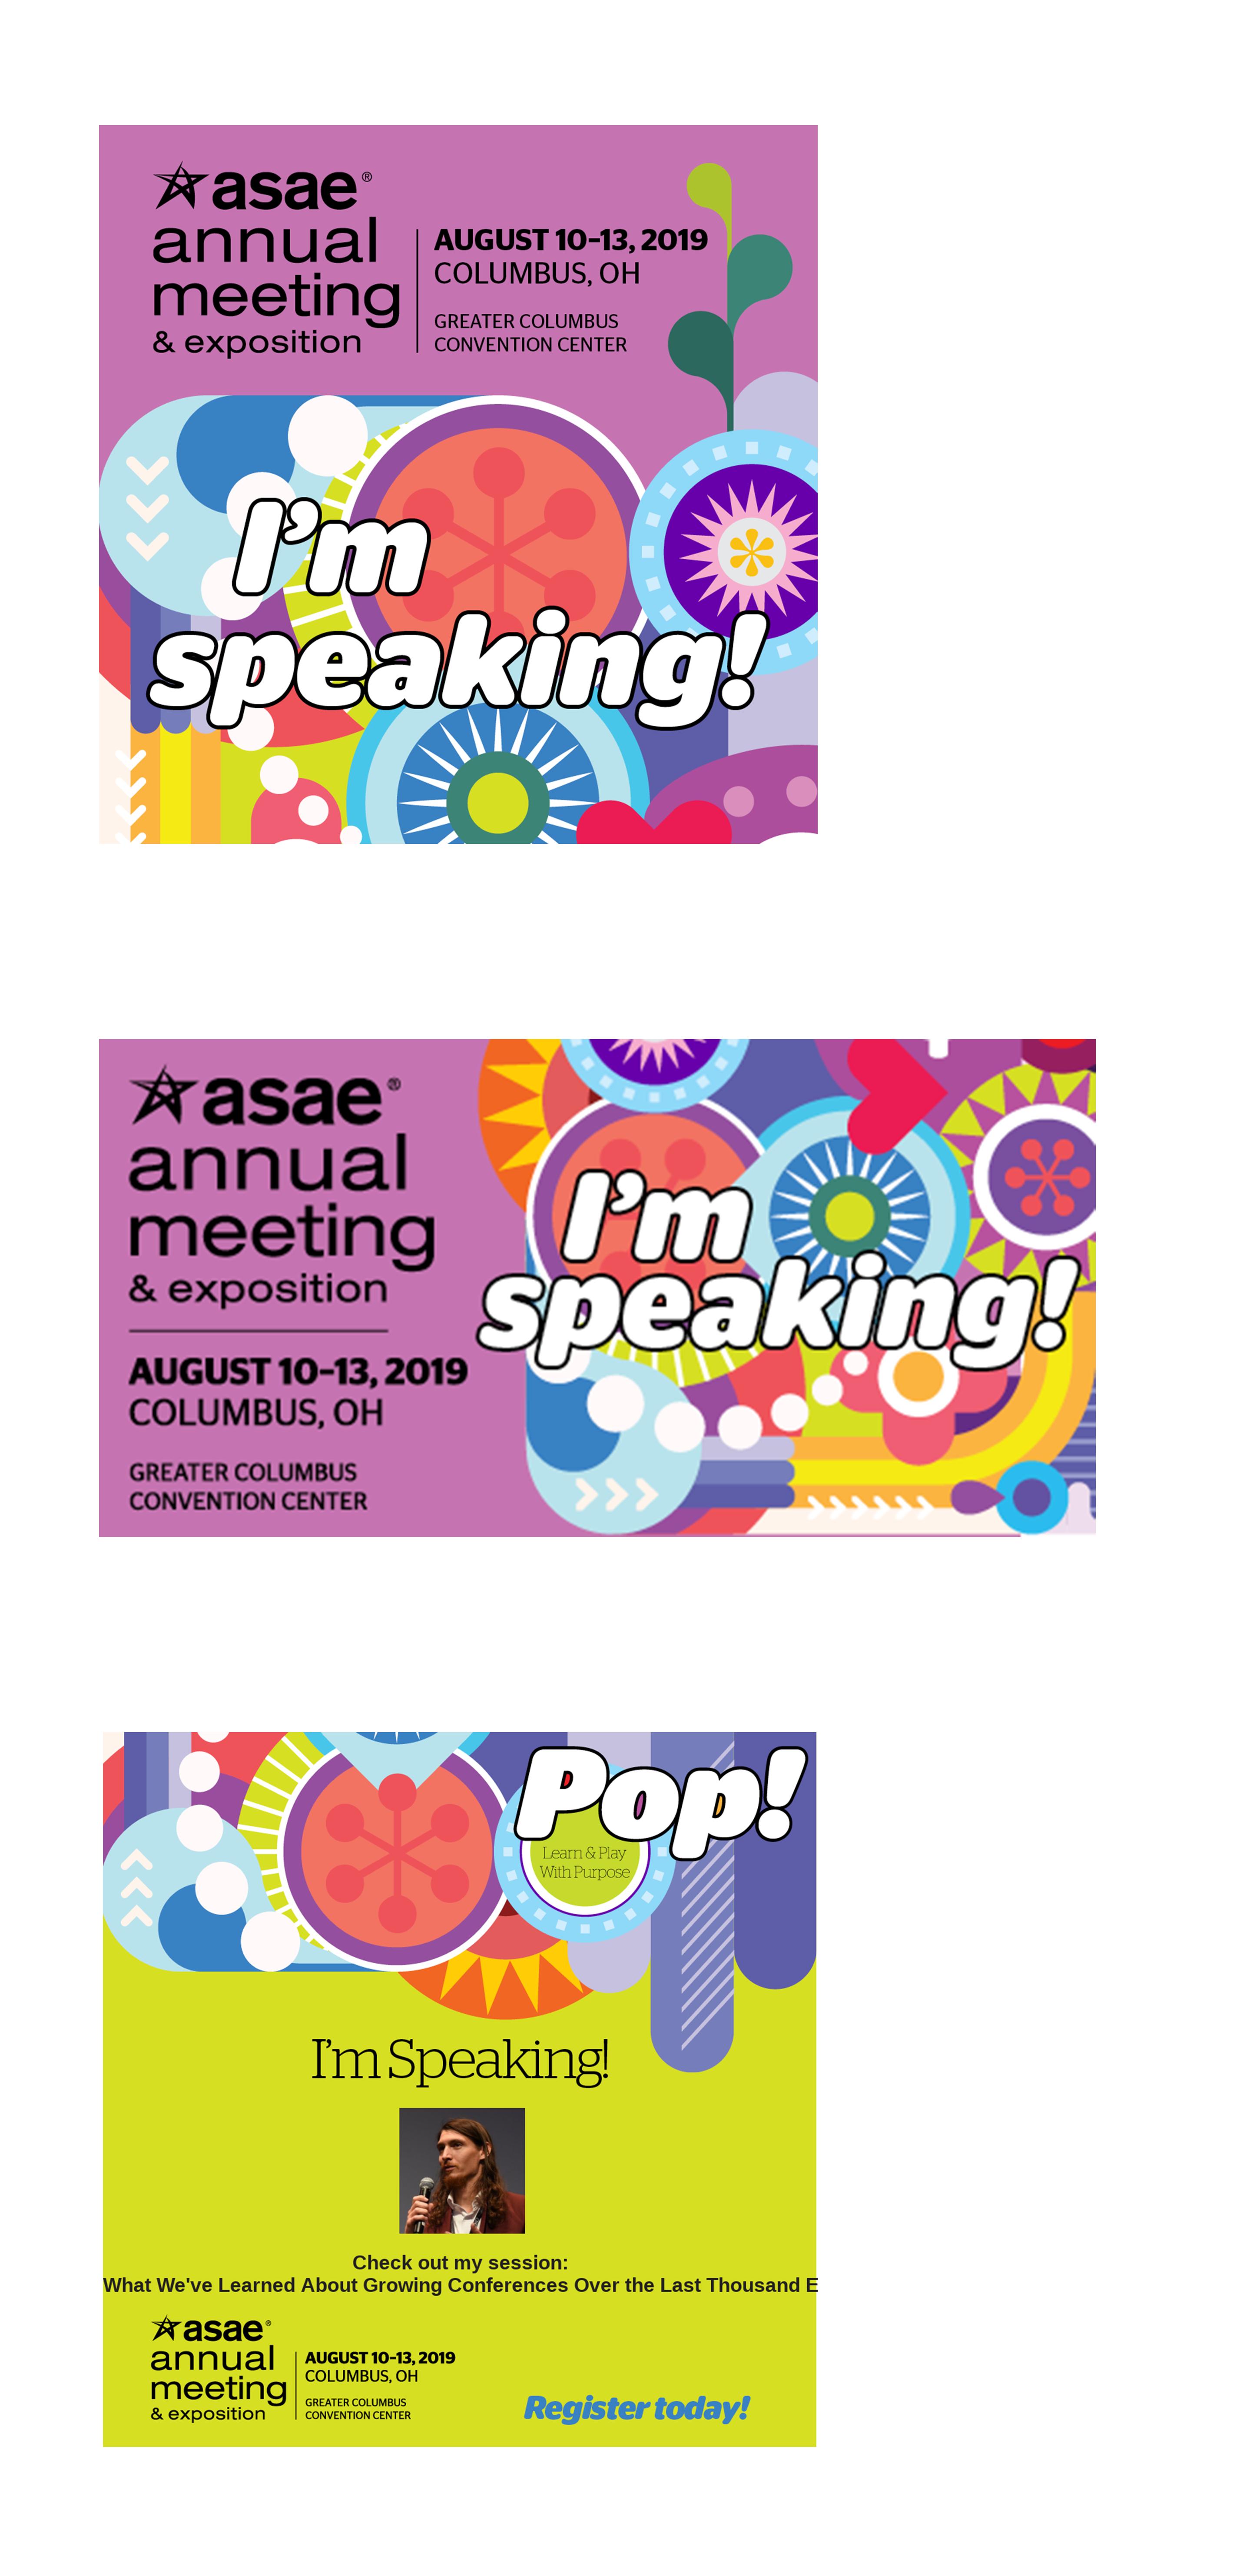 asae-annual-meeting-2019-partner-graphics-1